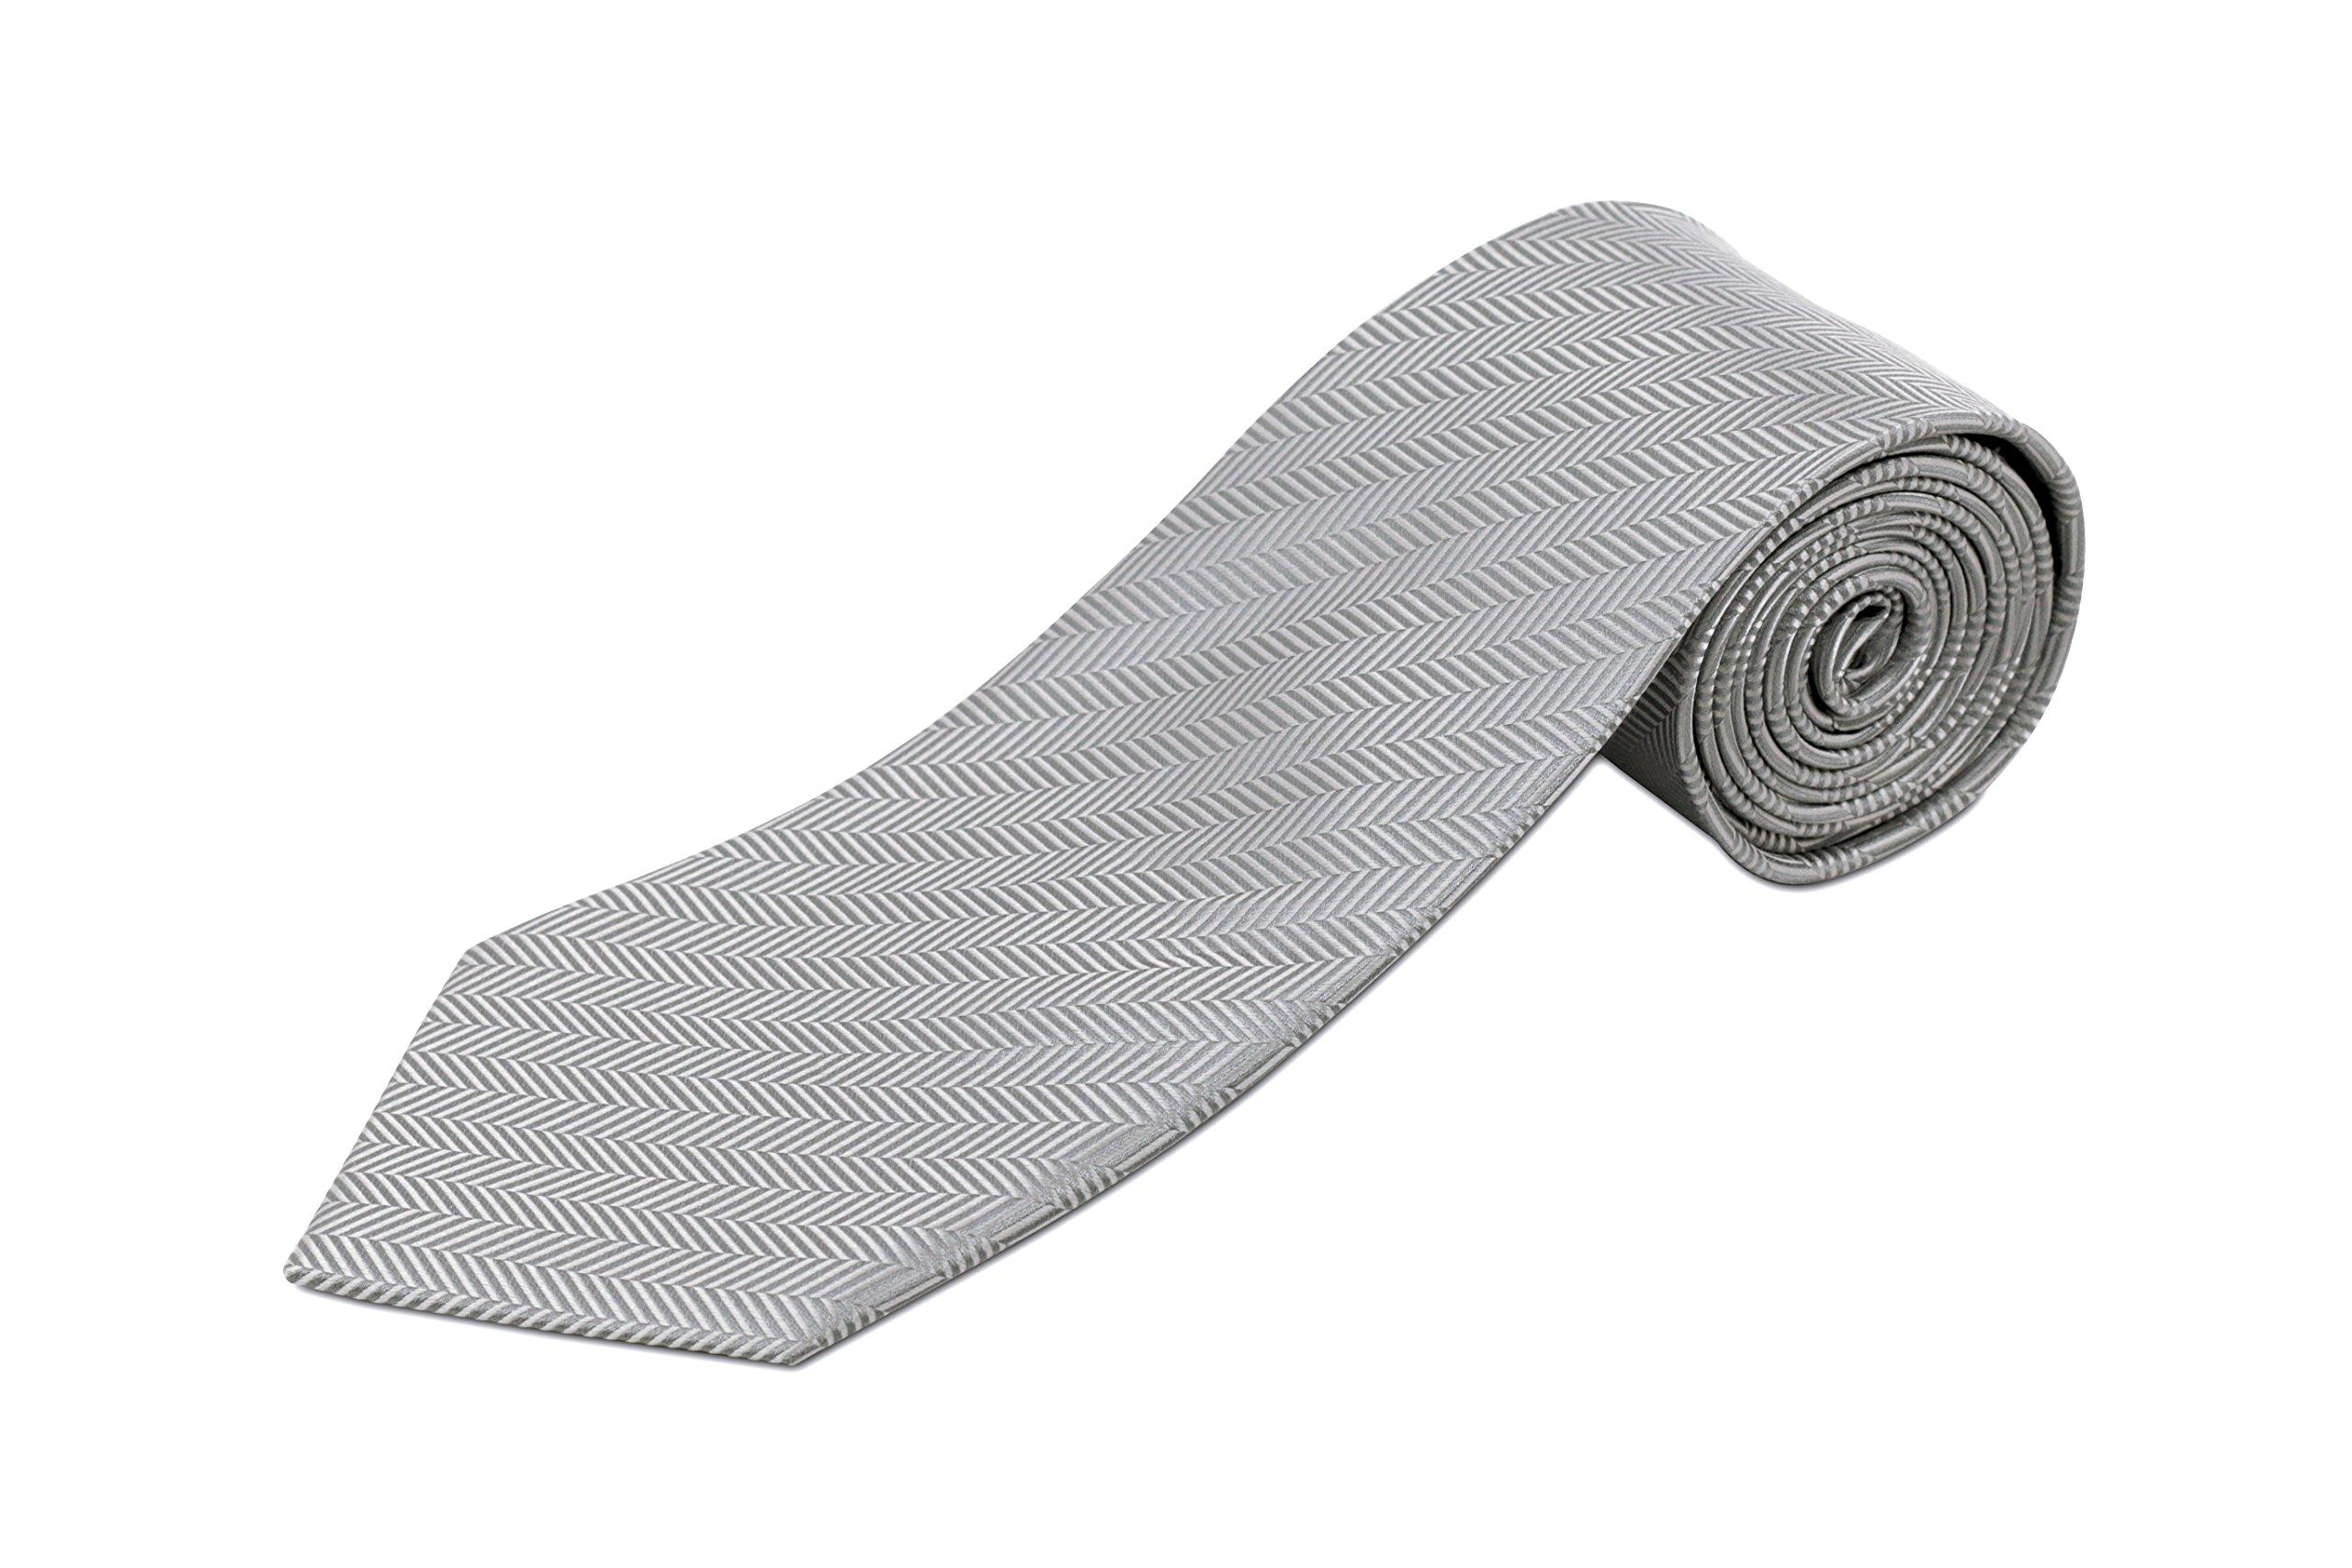 Extra Long Tie - Silver Herringbone Silk, 63 Inches Long